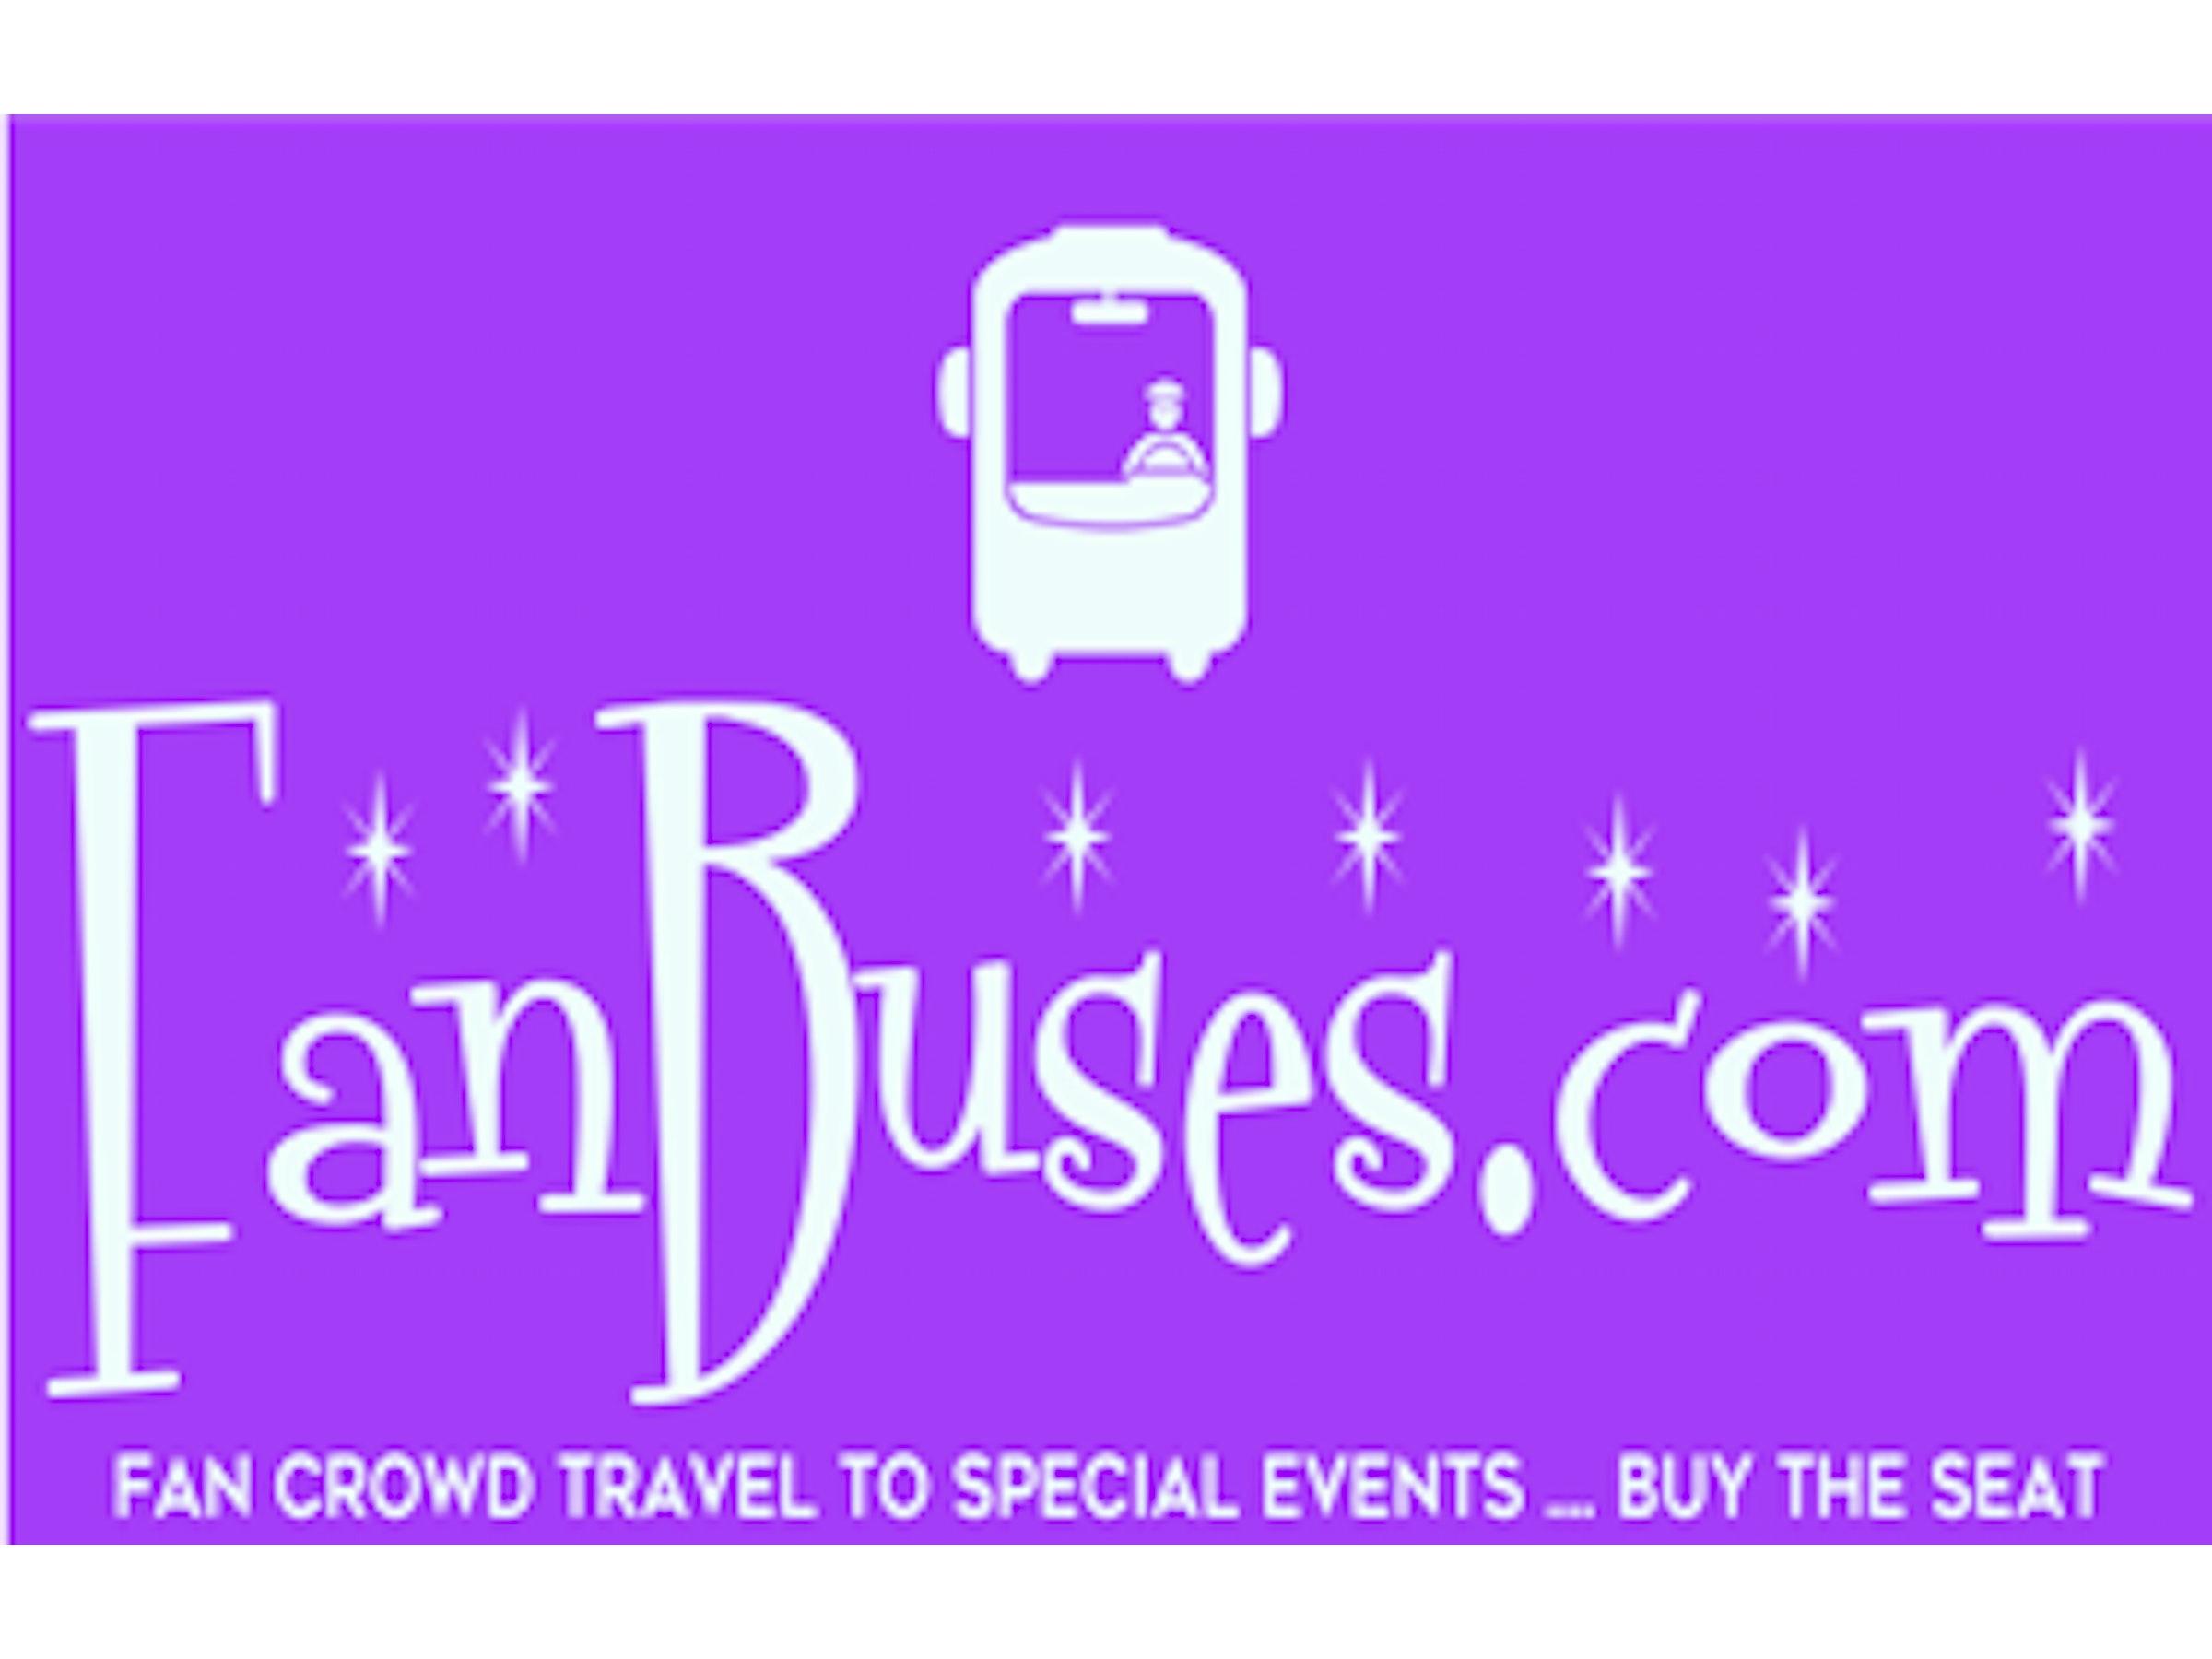 Fanbuses.com in Beyond Dallas